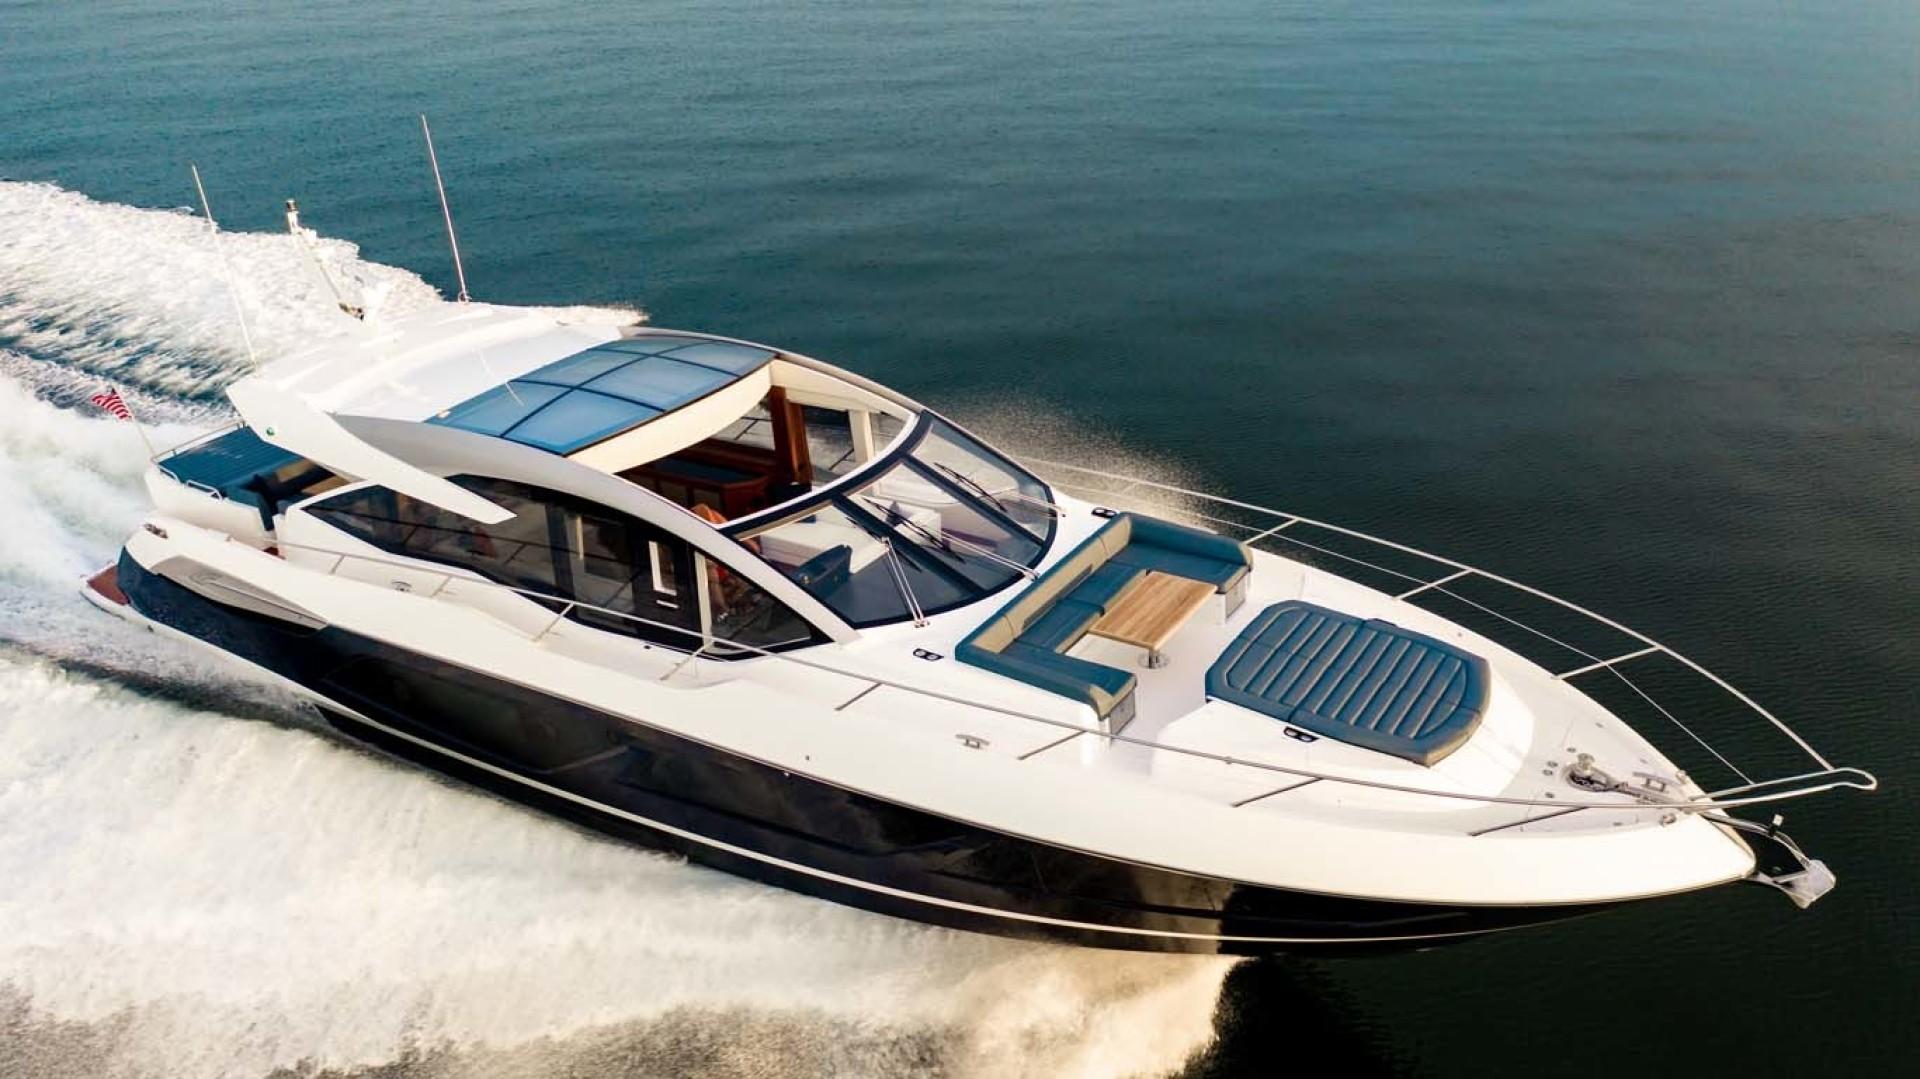 Sunseeker-Predator 2020-WIND@SEA Ft. Lauderdale-Florida-United States Cruising-1457475 | Thumbnail